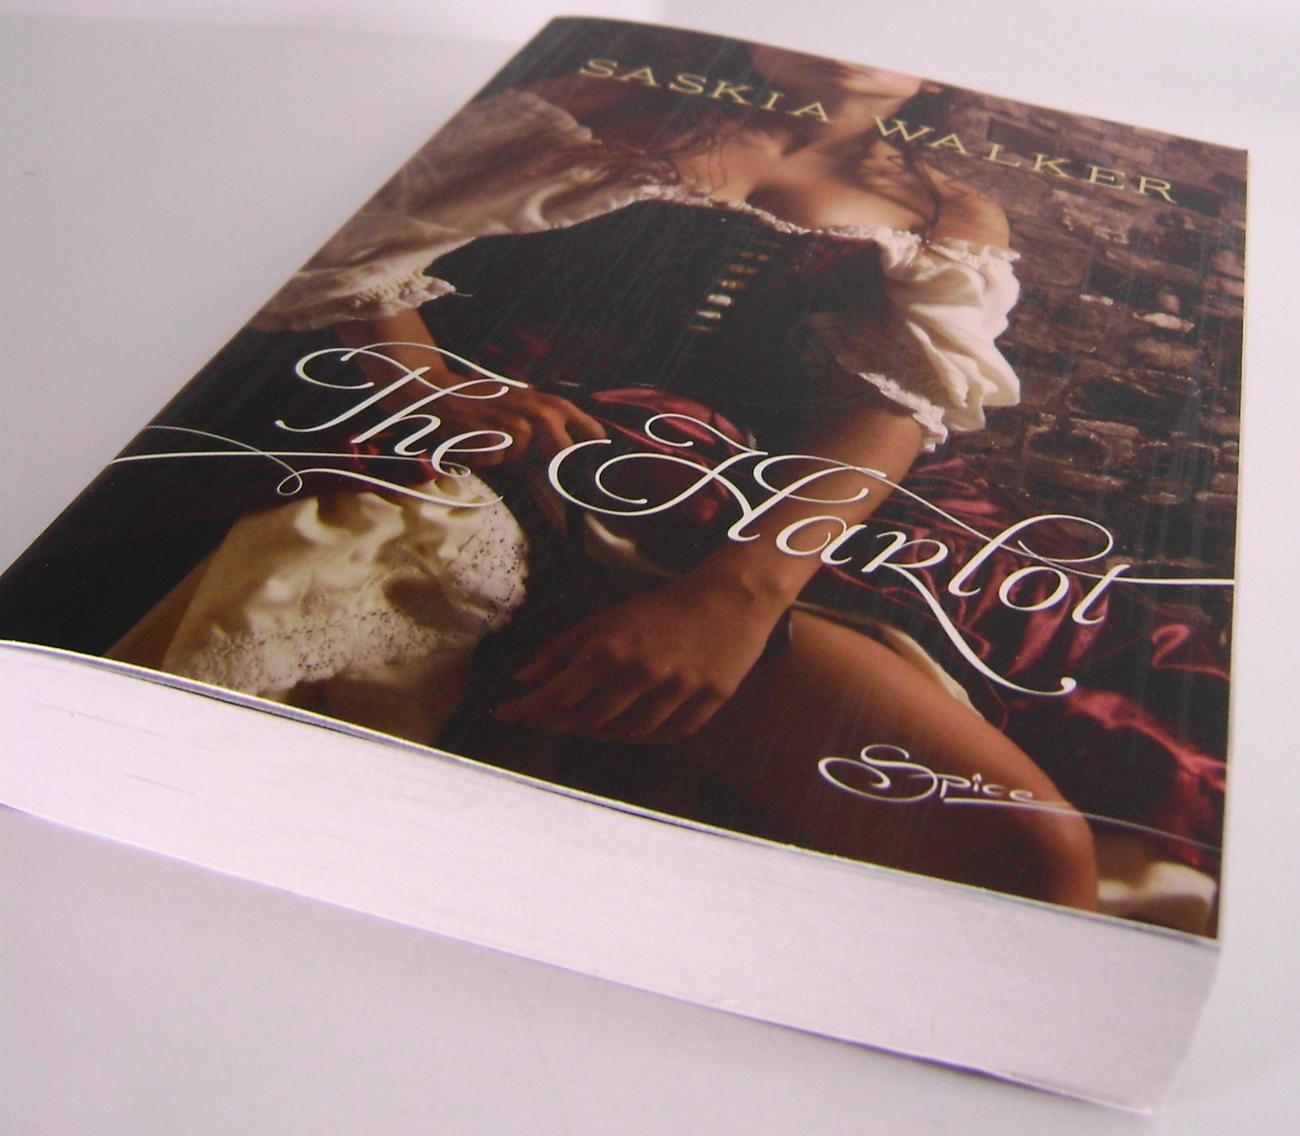 The Harlot By Saskia Walker HQ Spice Book PB